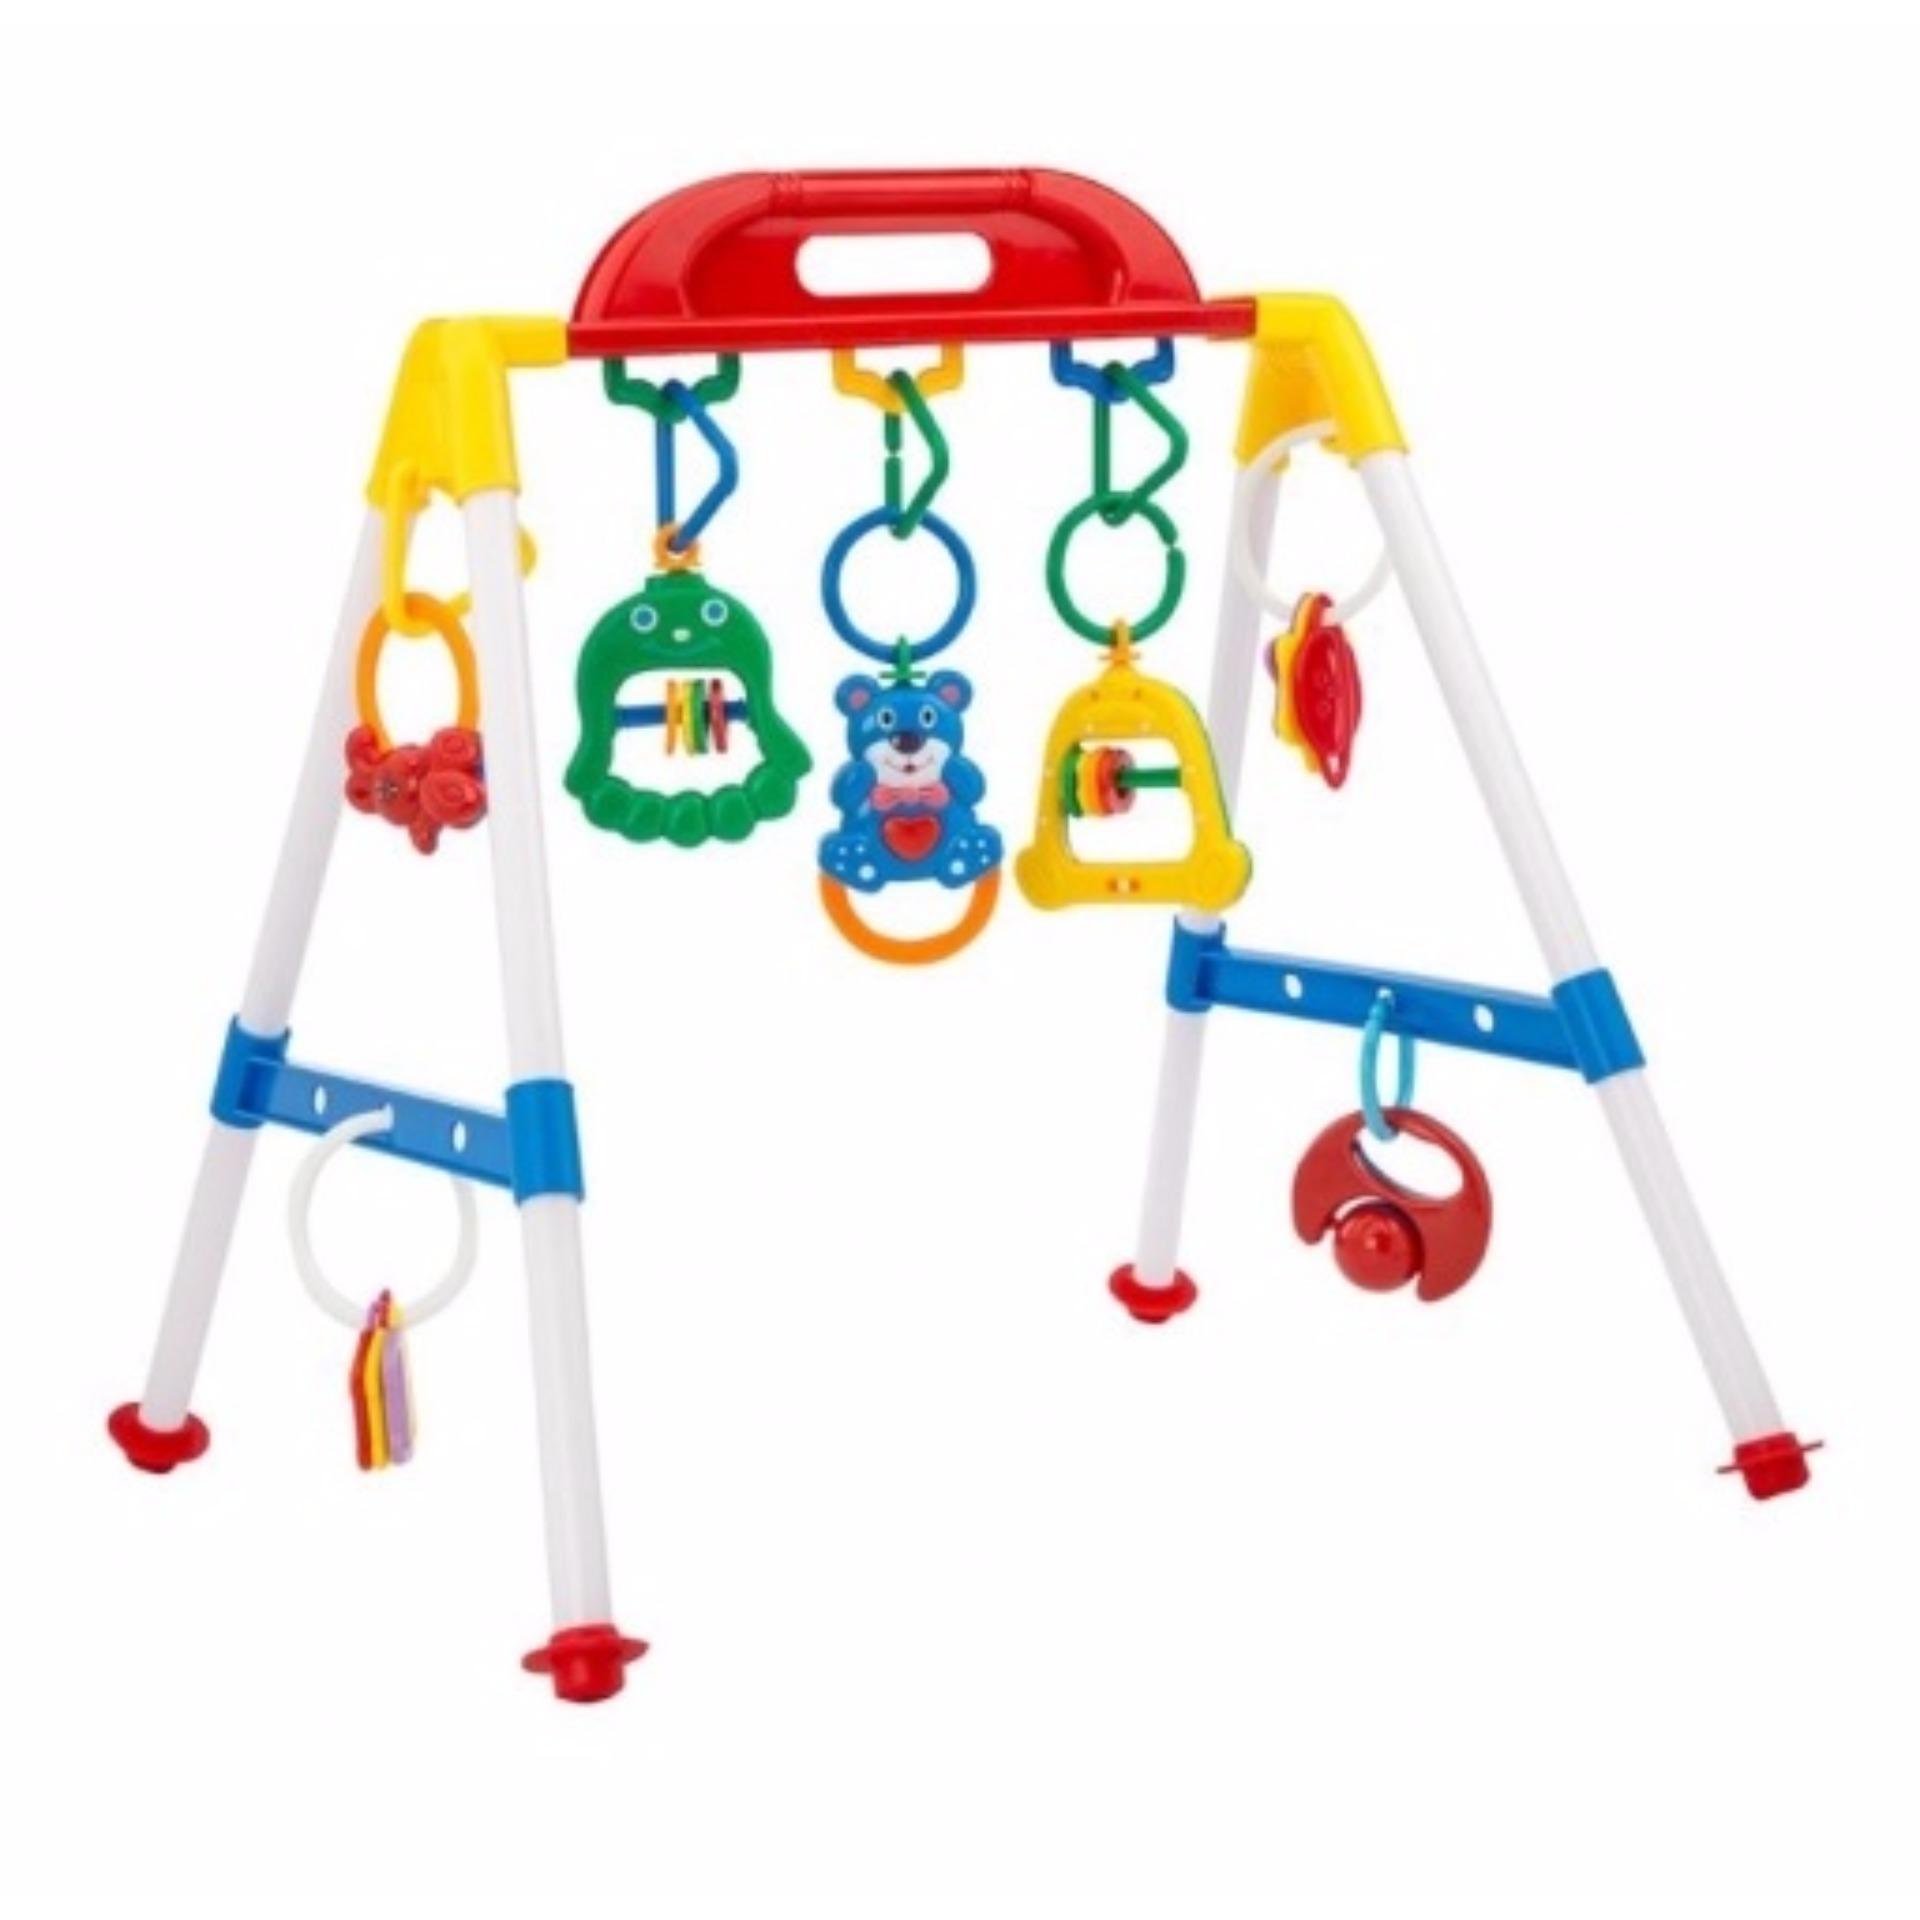 ... Baby Musical Play Gym Musik Mainan Rattle Bayi Anak Playgym ...